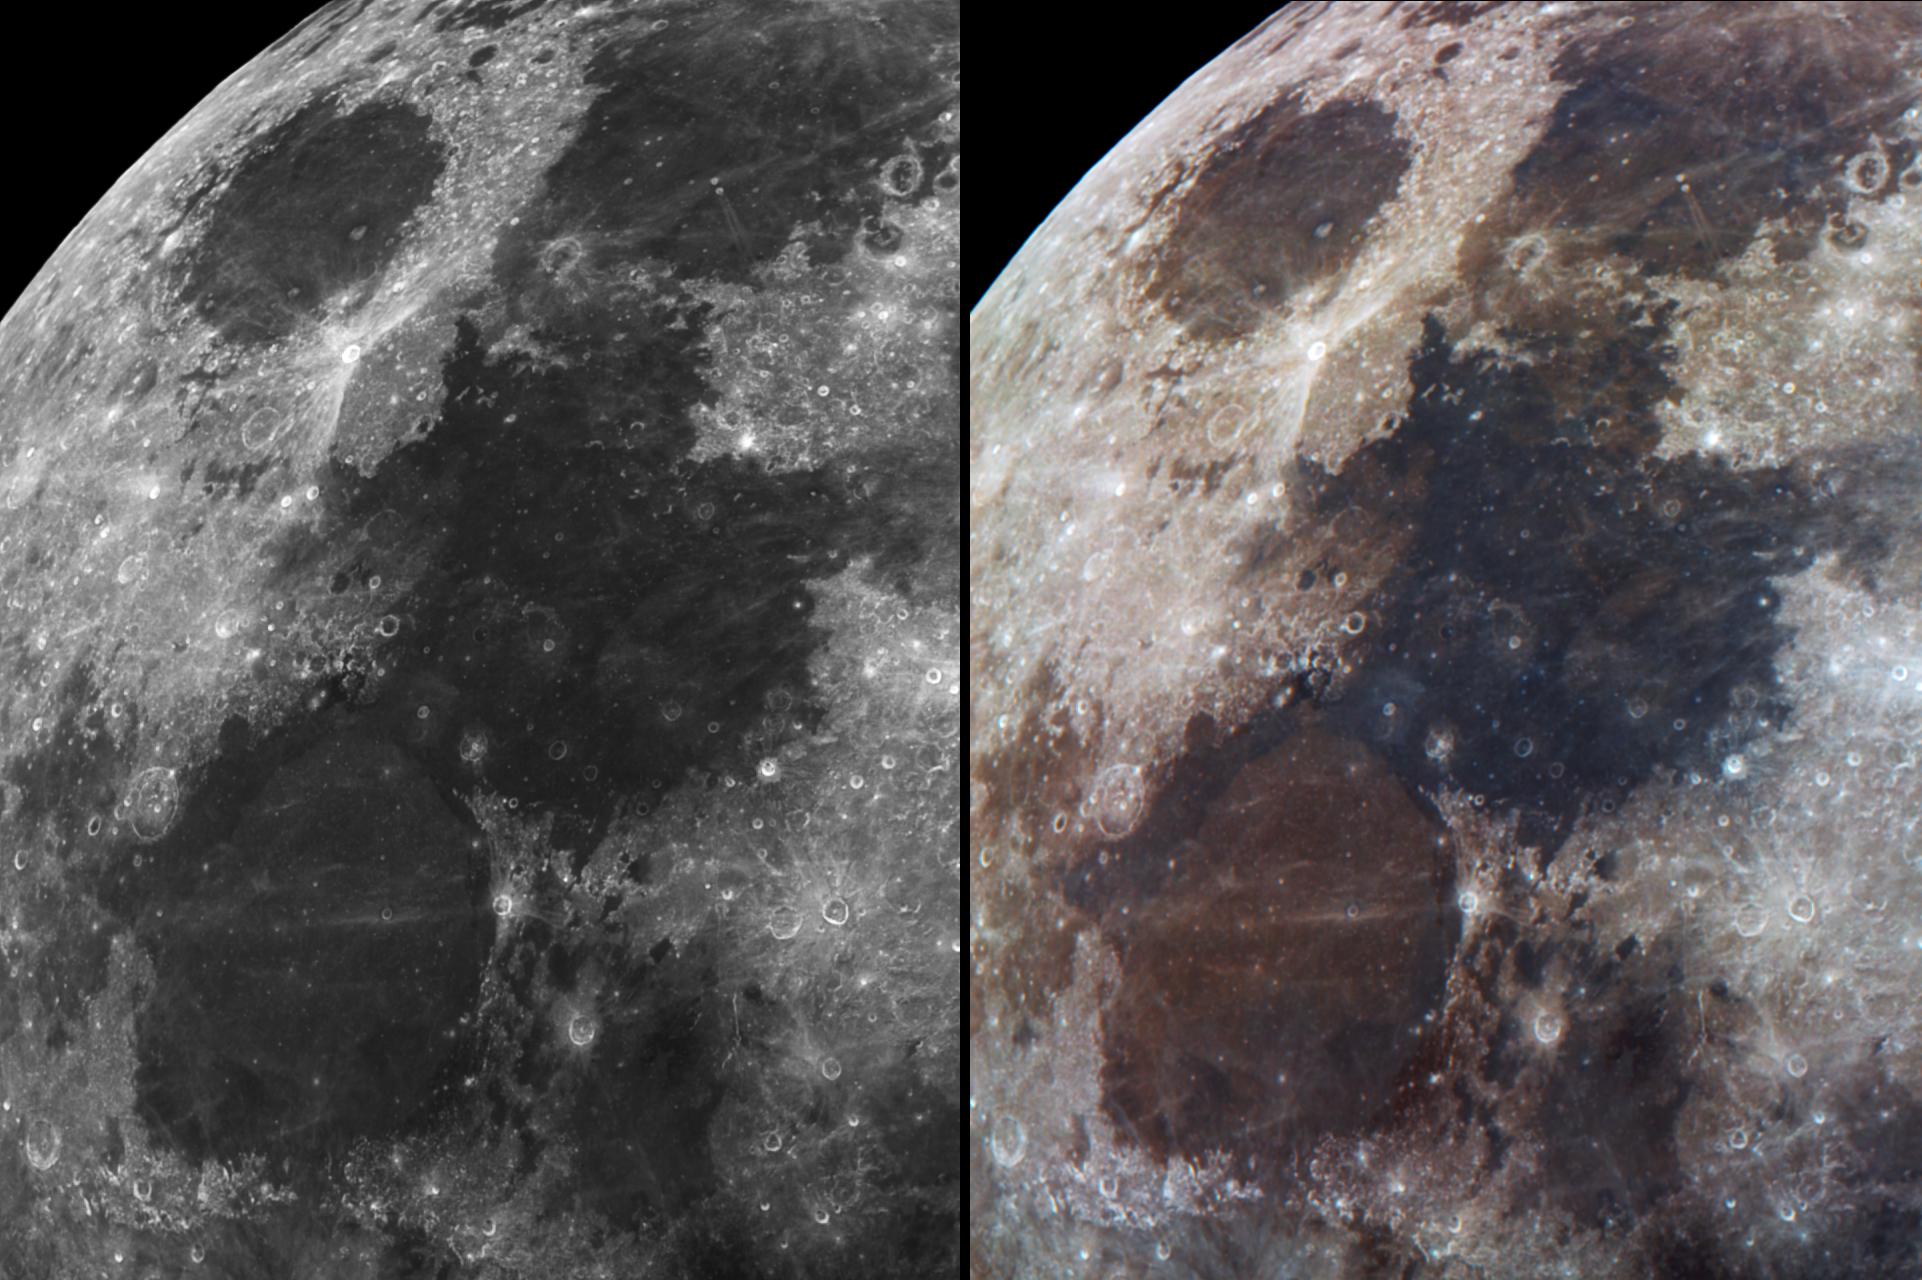 Lunar maria and colors 16042019 2350